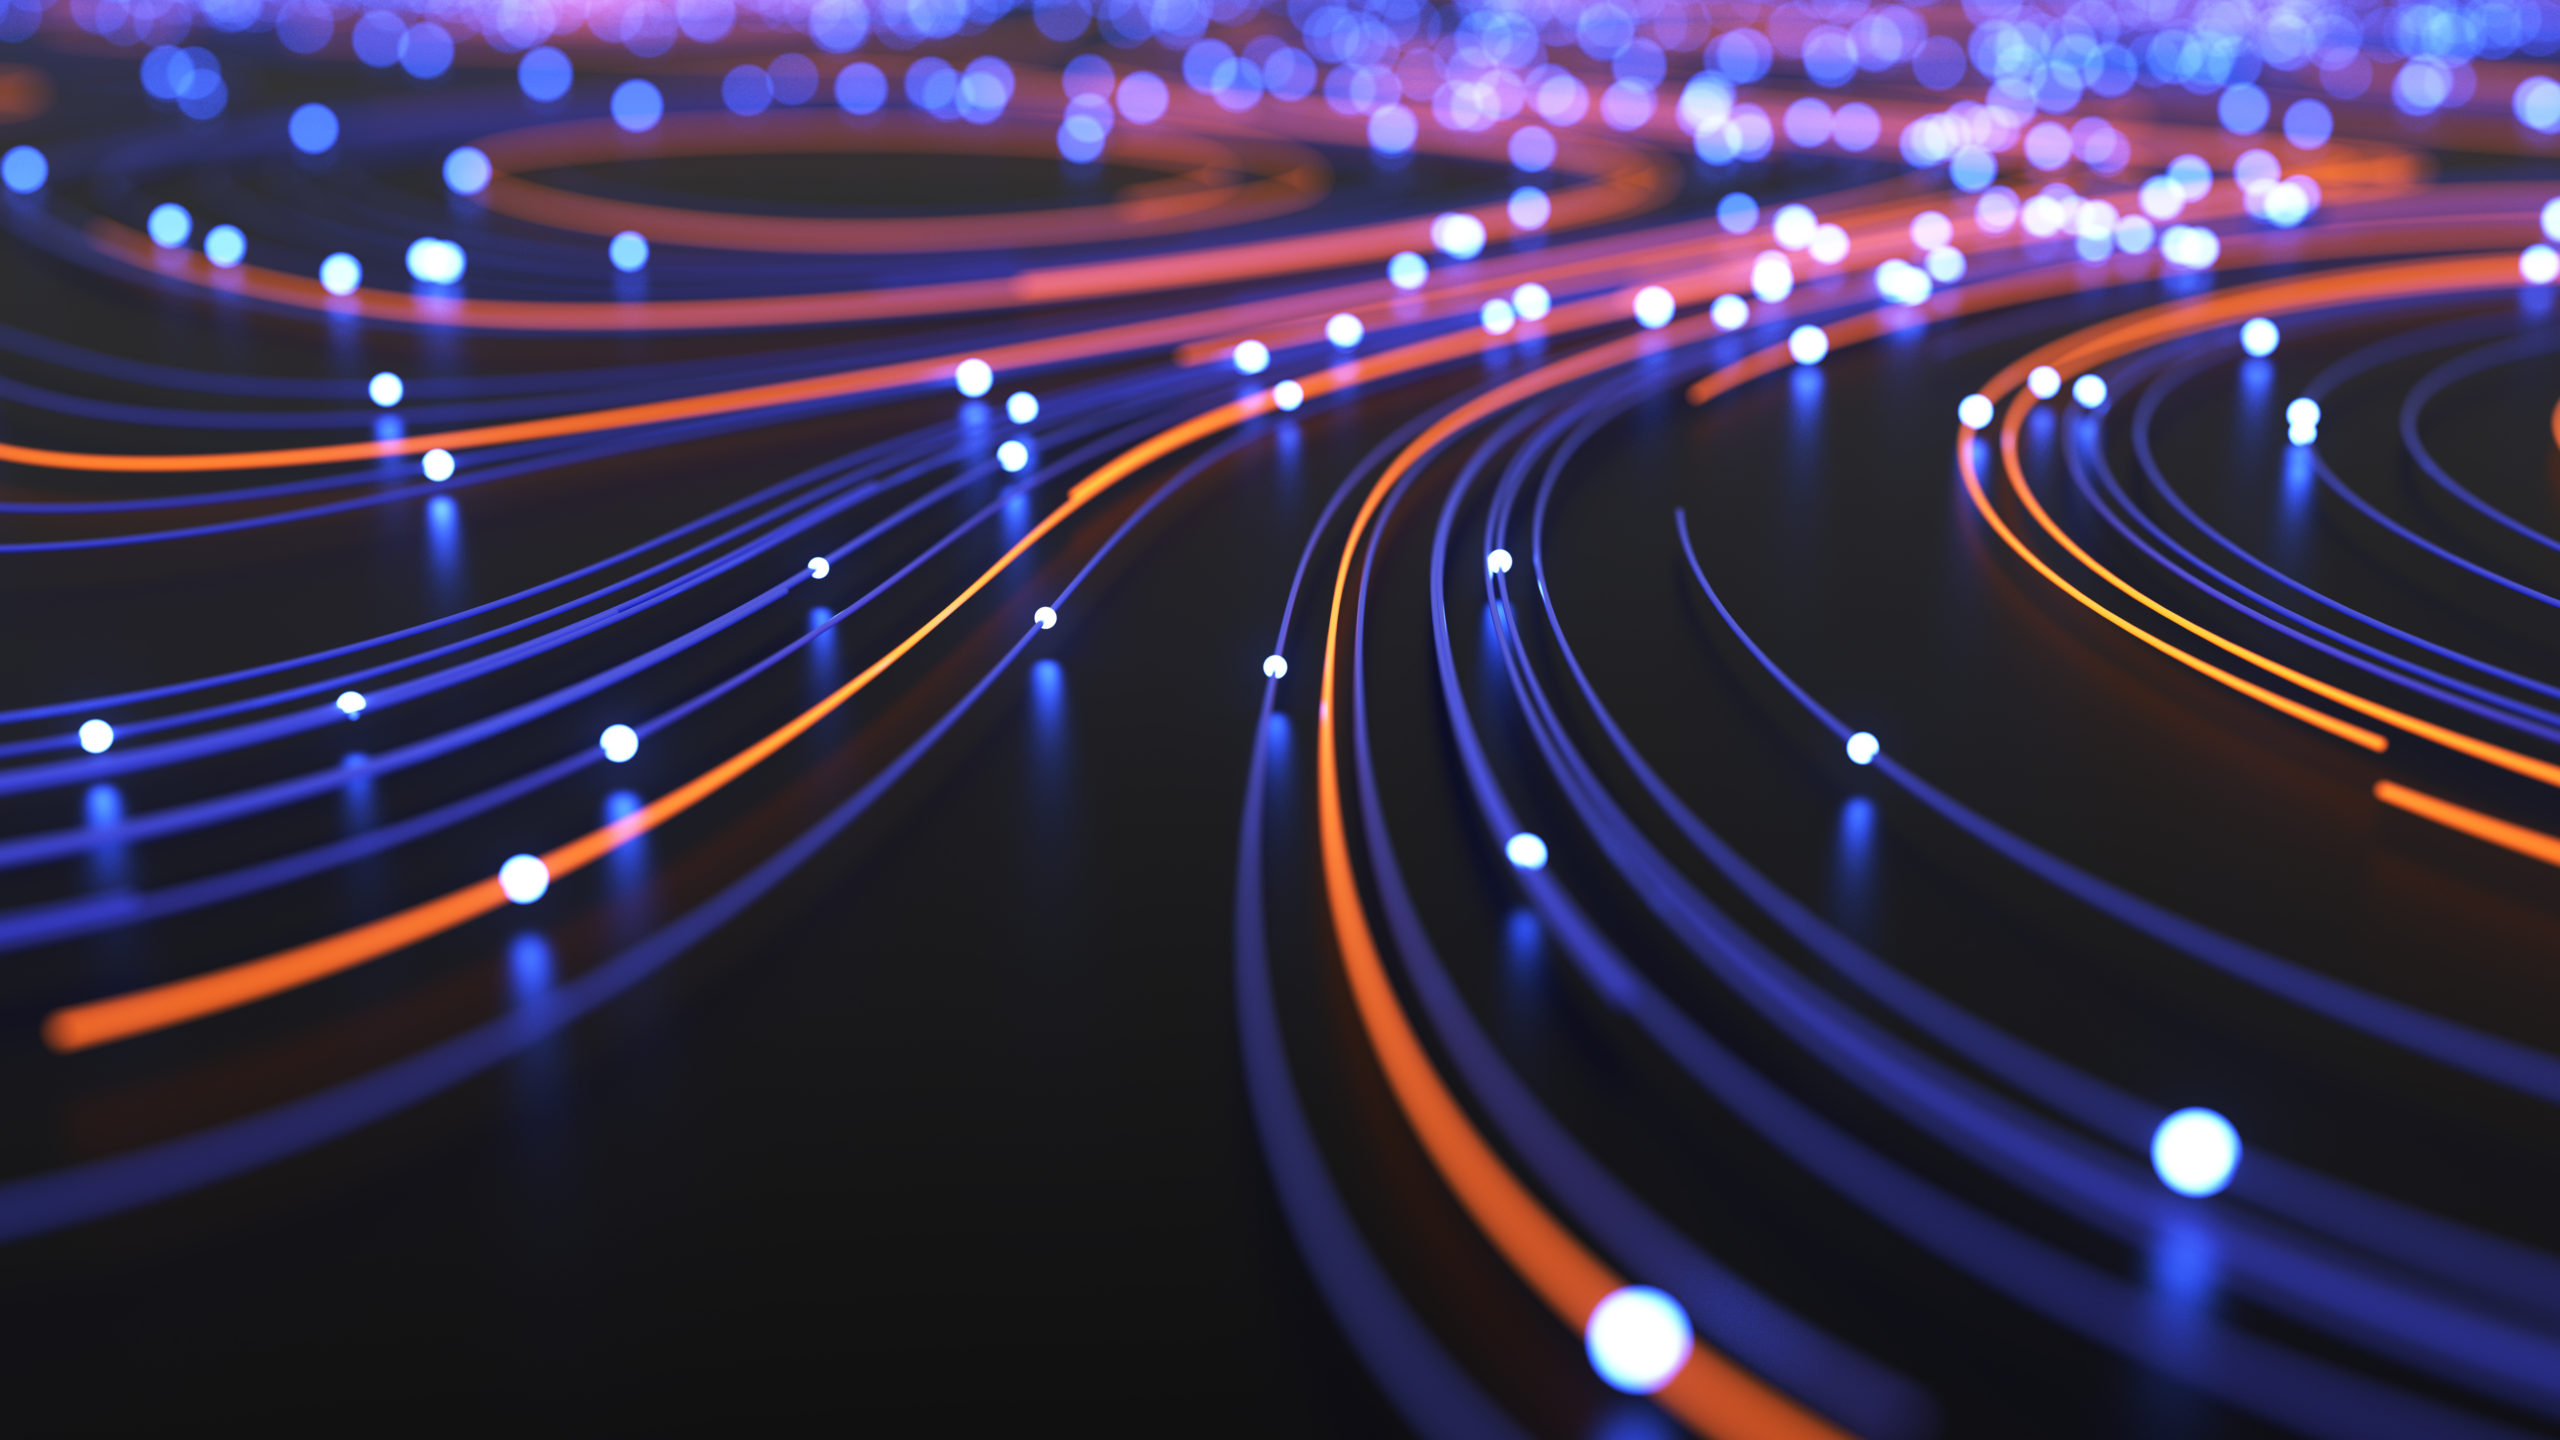 Digital infrastructure trust seeks to improve energy efficiency